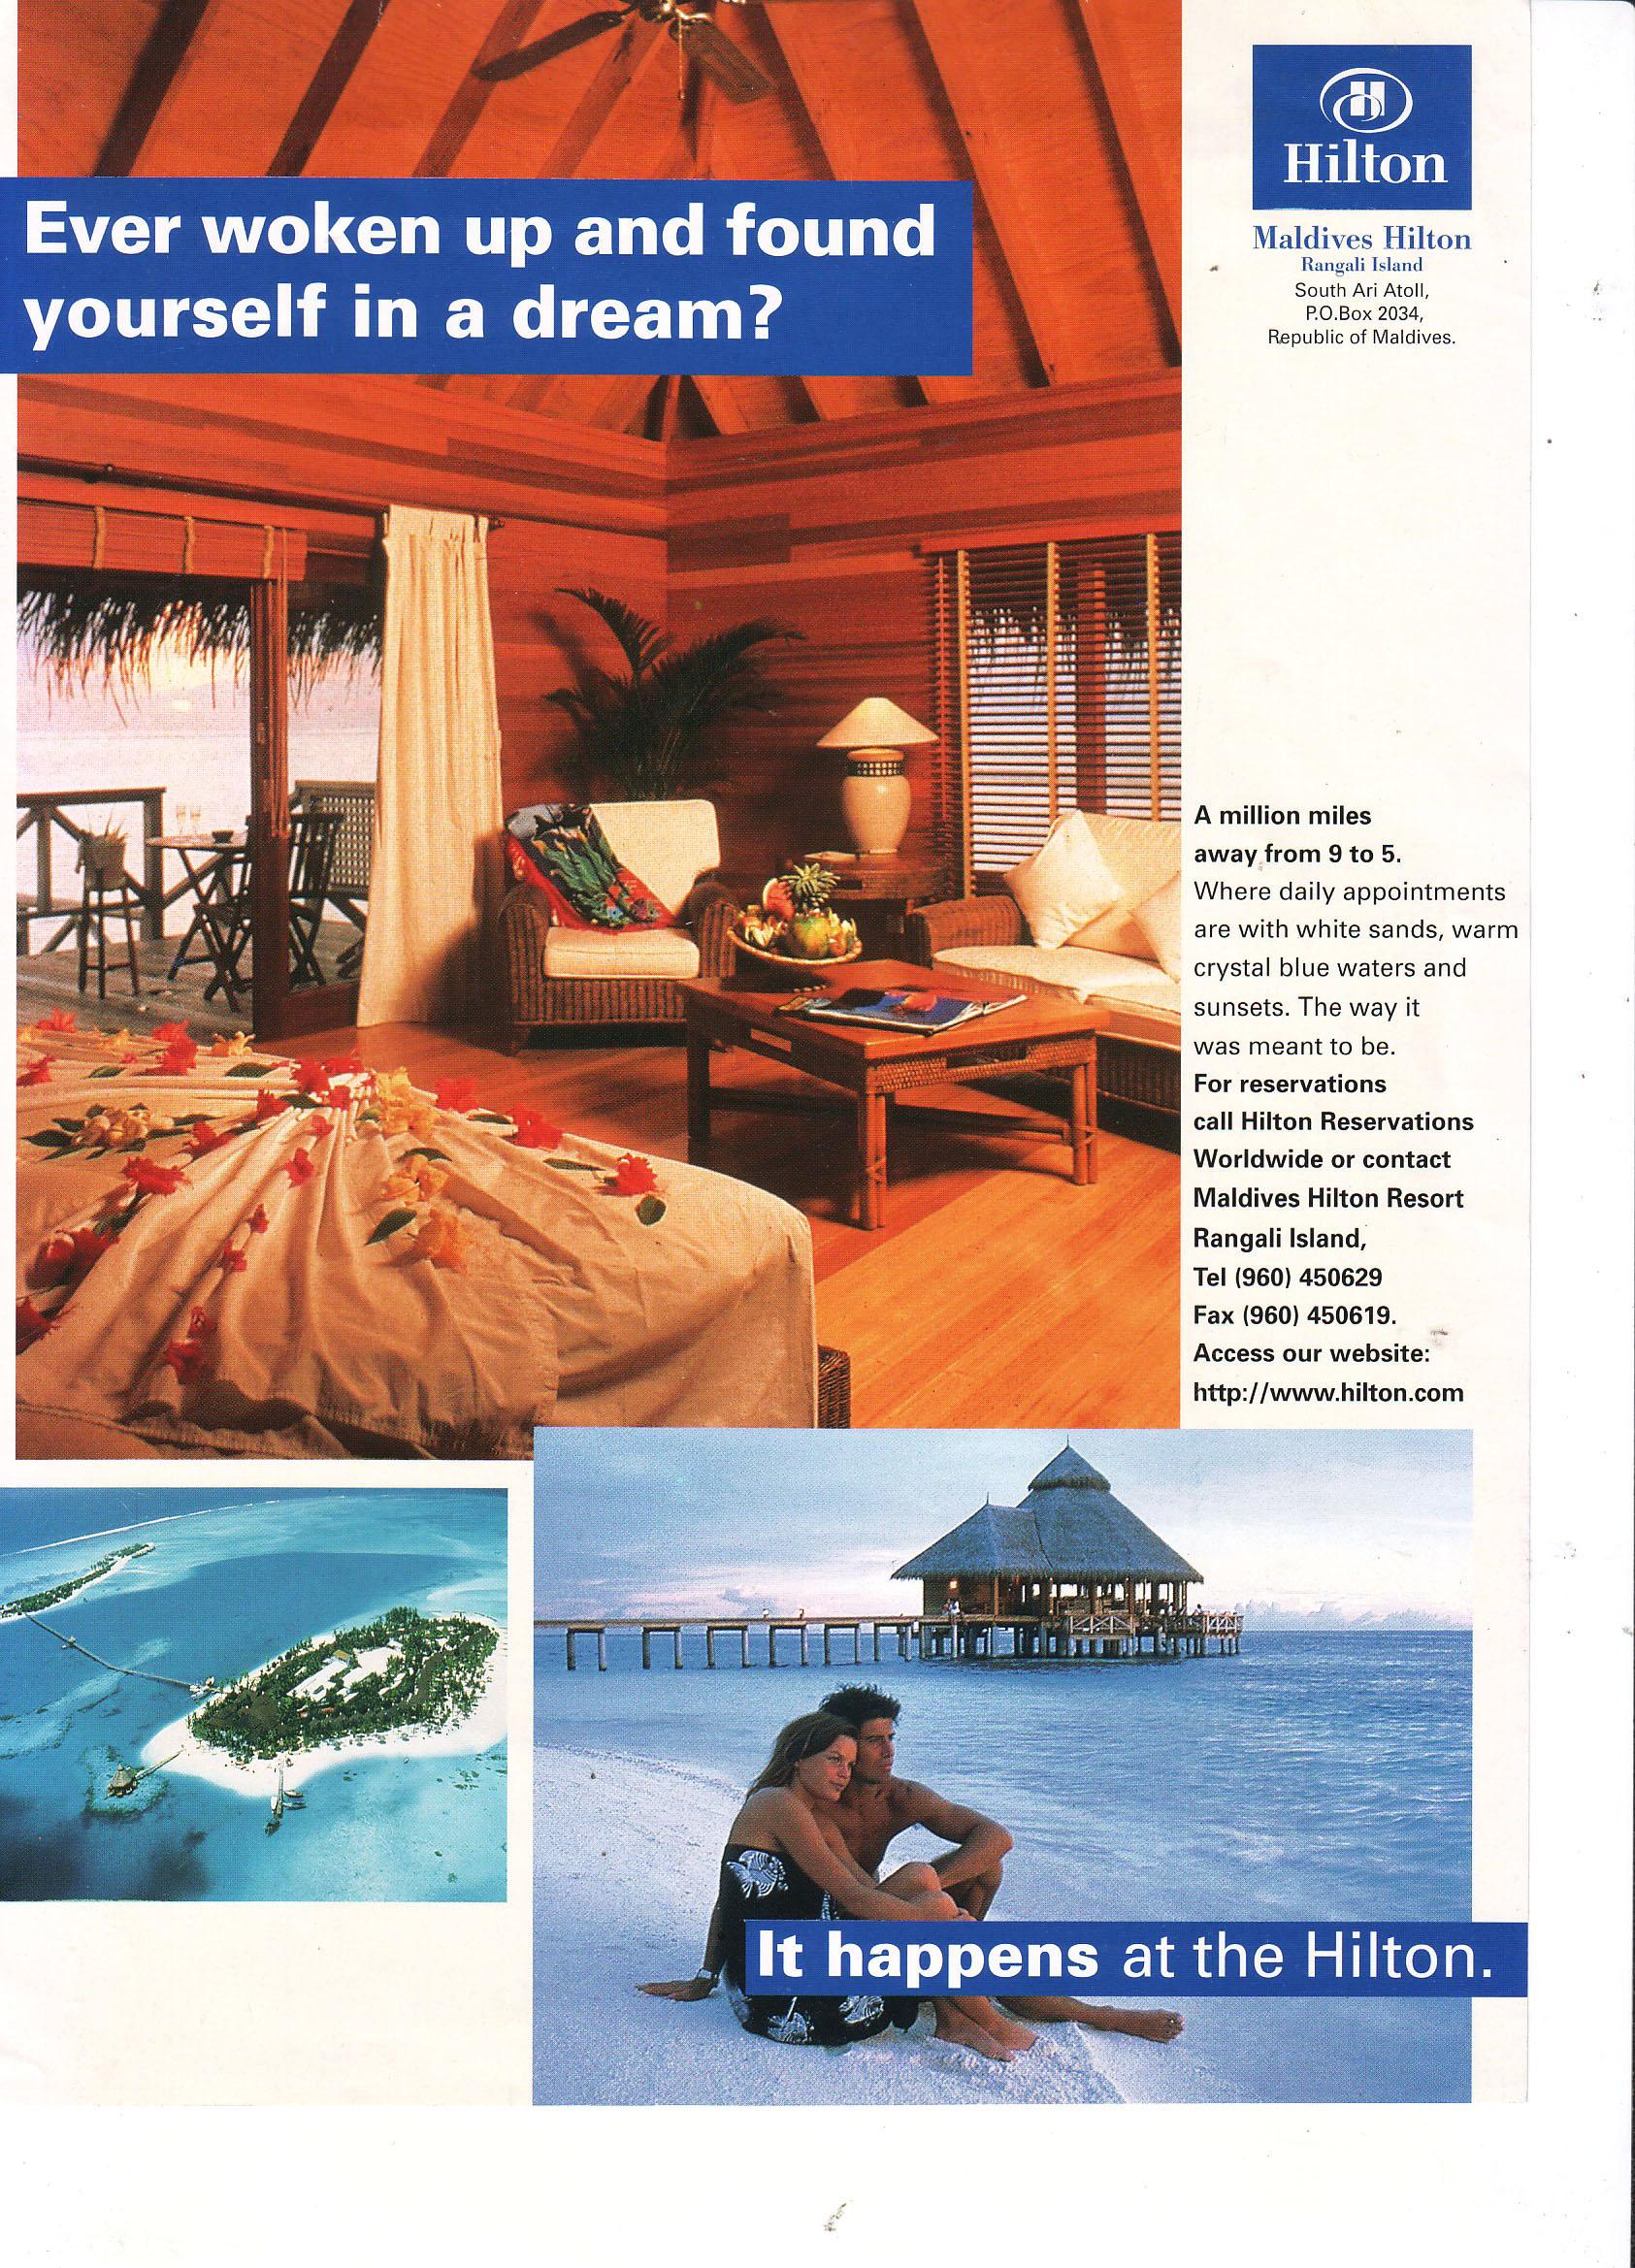 HILTON MALDIVES HOSPITALITY ADVERTISEMENT | blueorangeasia